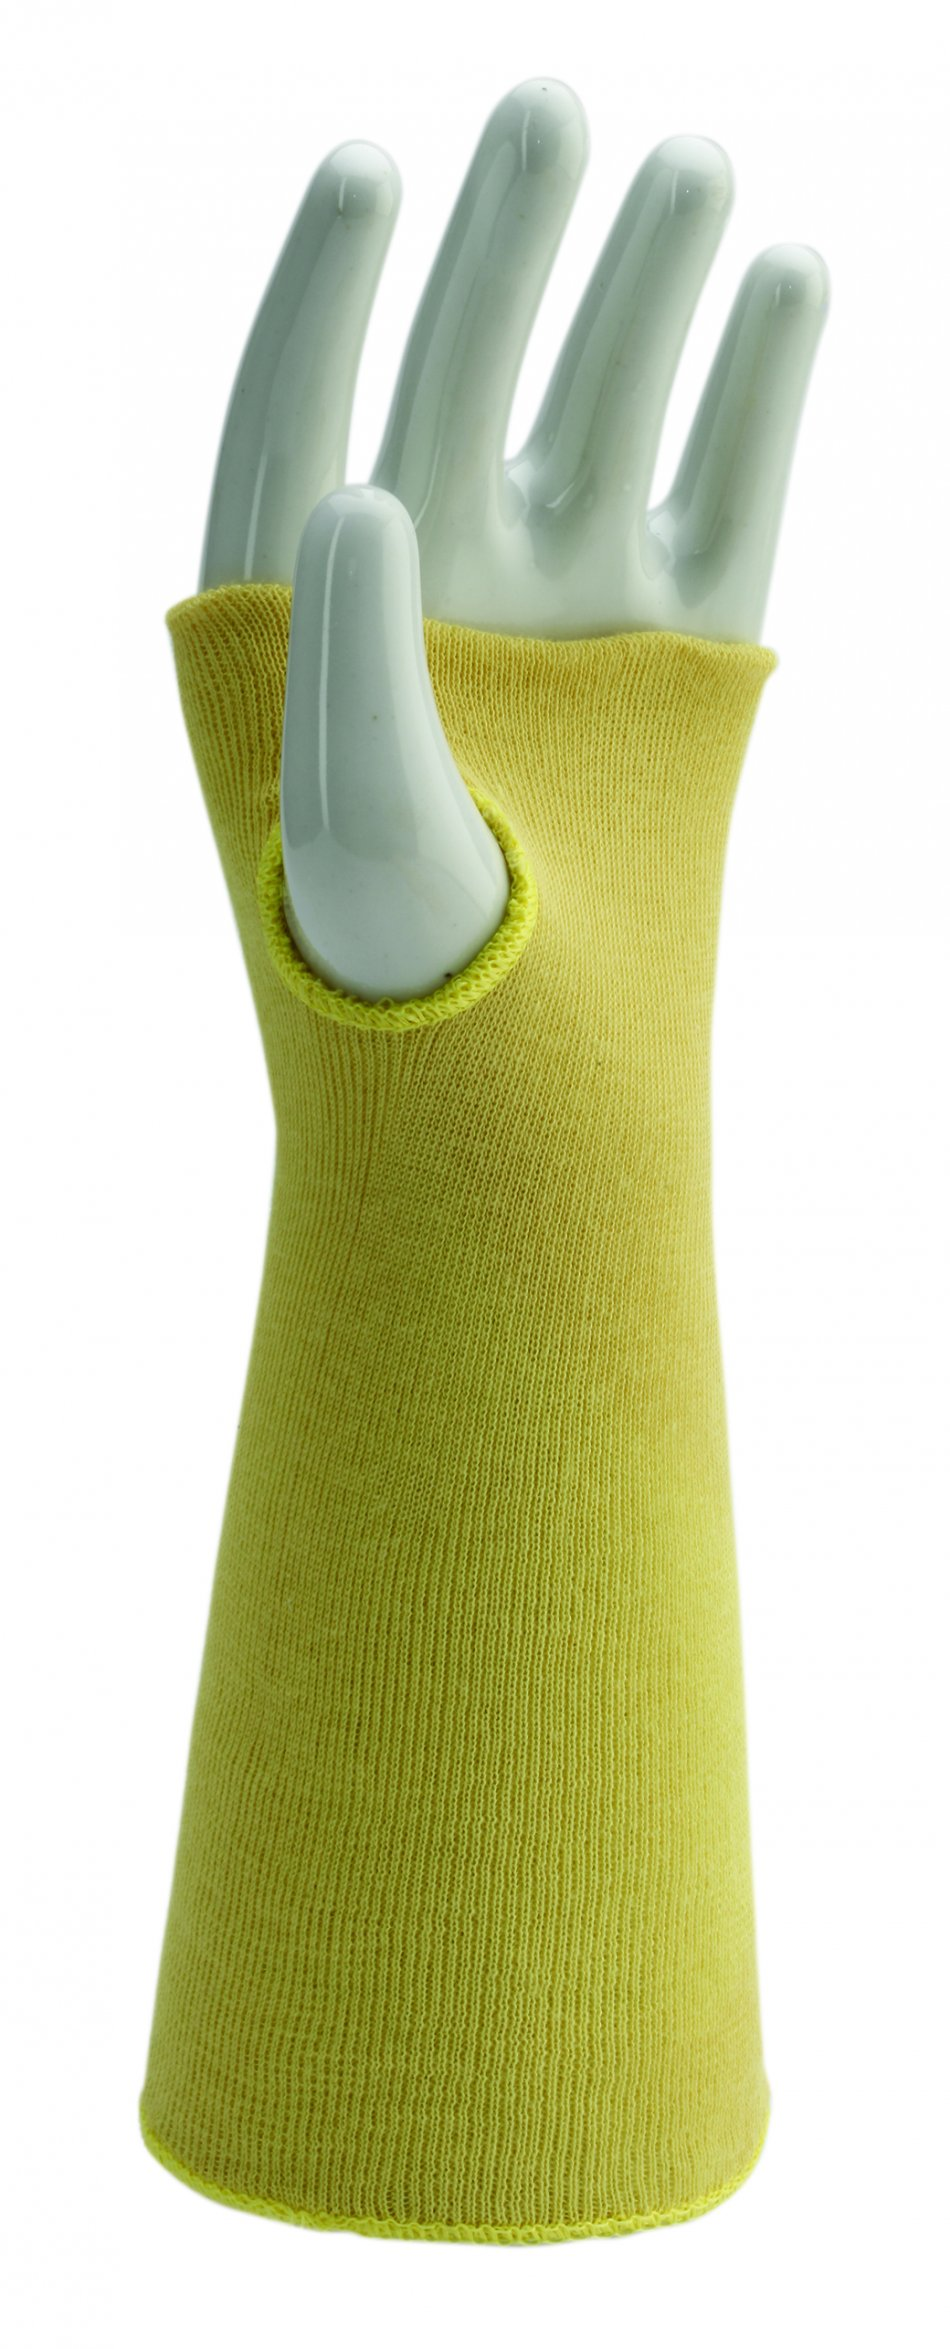 Protector kevlar pentru antebraţ,35 cm